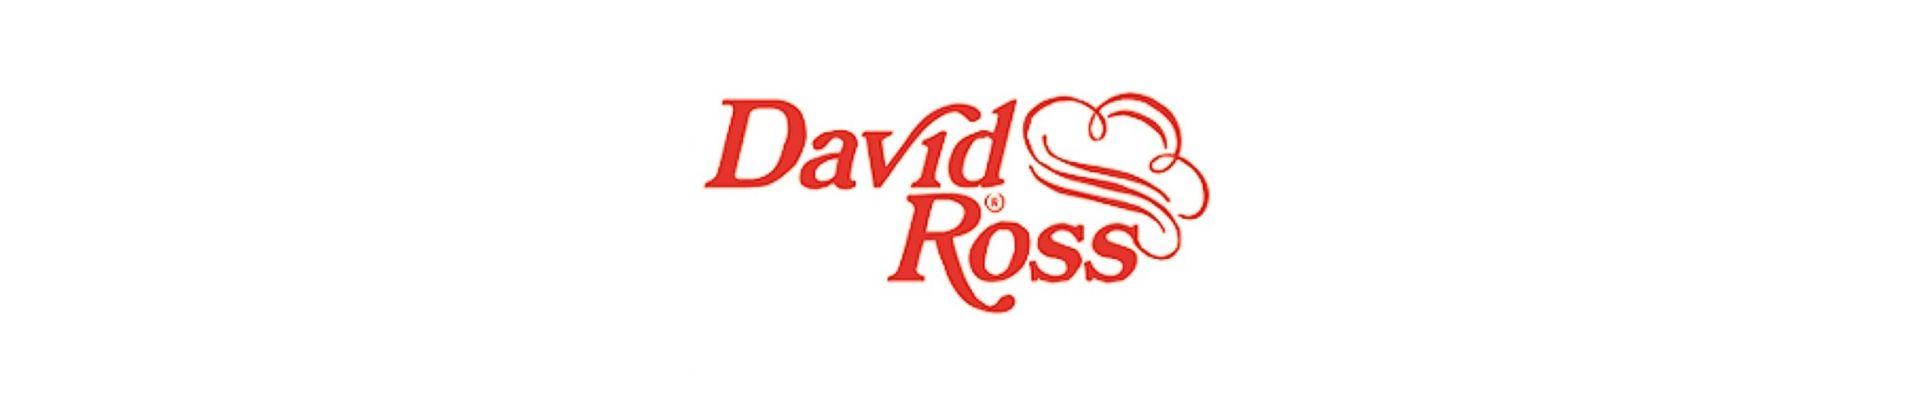 Filtre tigari David Ross. Minifiltre nicotina David Ross. Cumpara filtre tigari David Ross